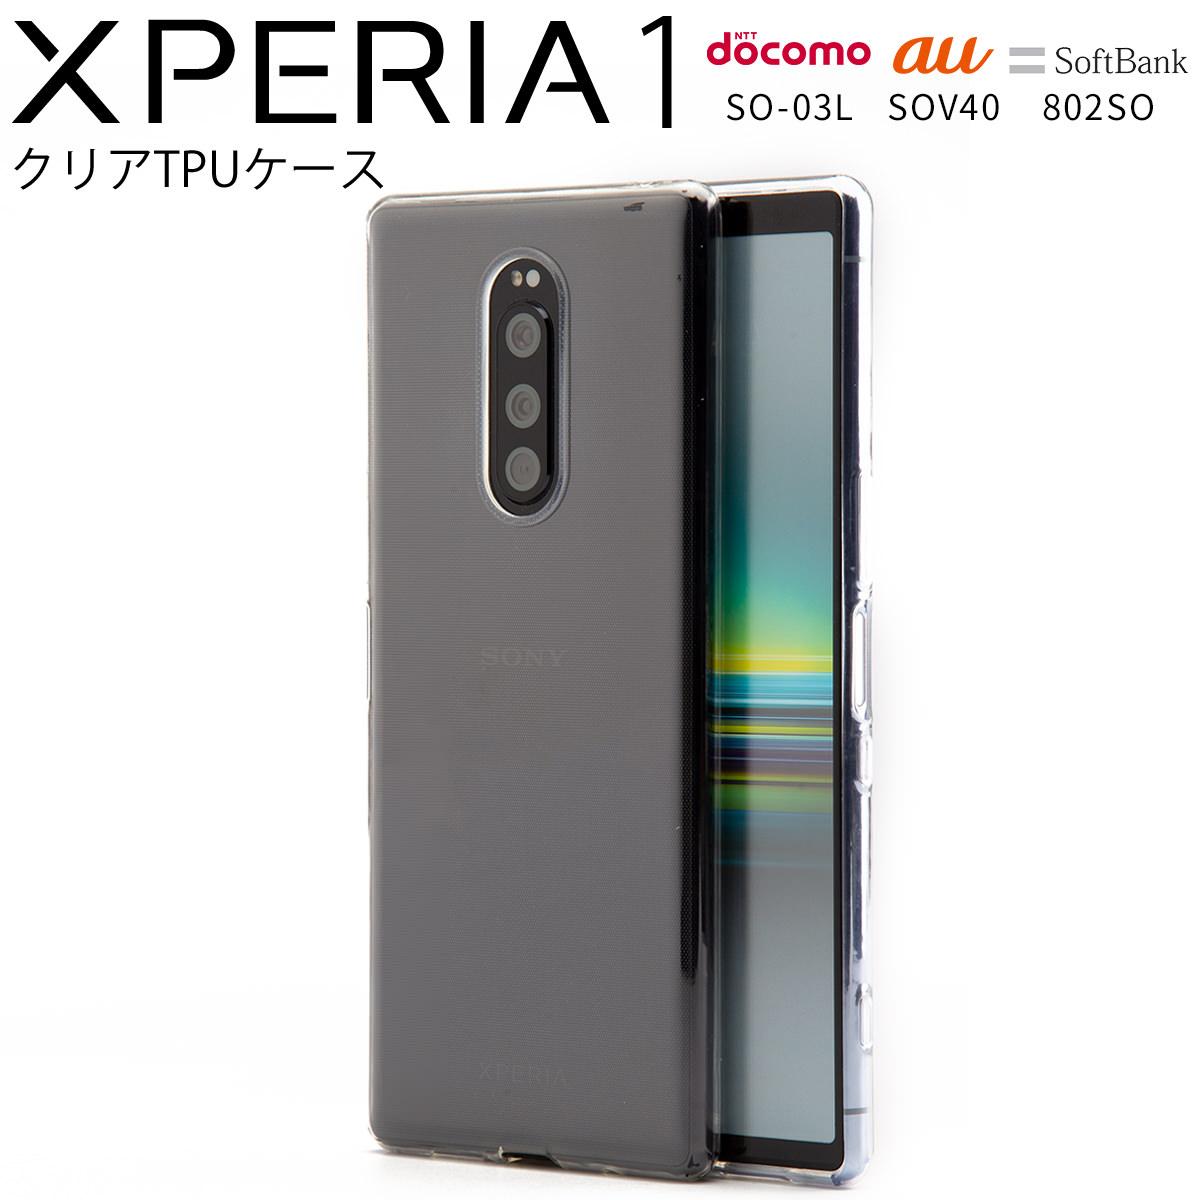 Xperia 1 SO-03L SOV40 901SO TPU クリアケース ソフトケース エクスペリア xperia so-03l sov40 901so ドコモ ソフトバンク au